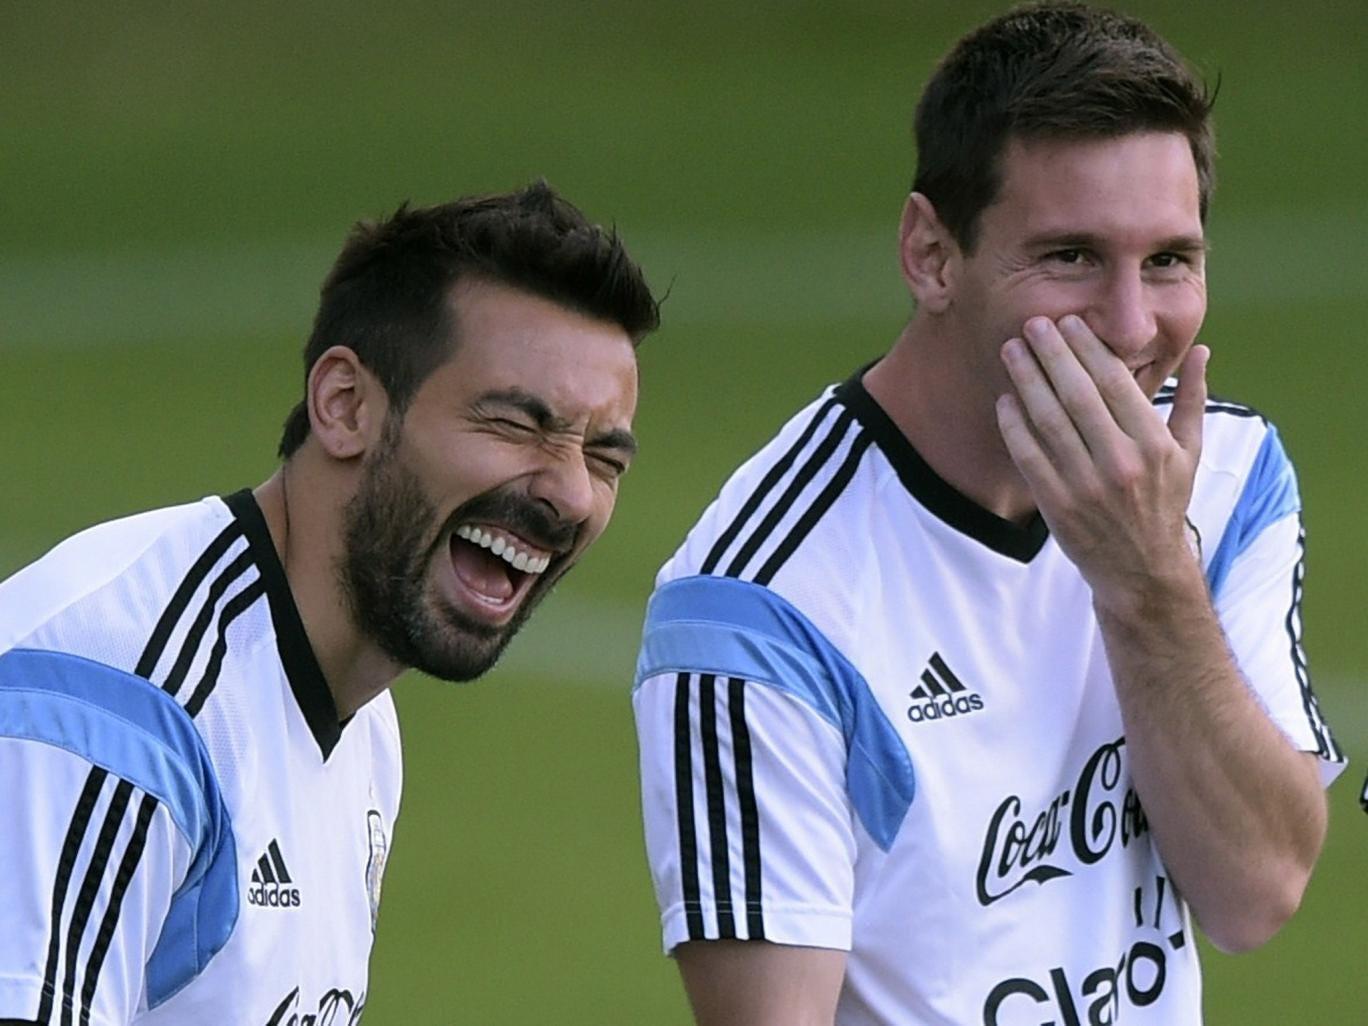 Ezequiel Lavezzi and Lionel Messi share a joke during training